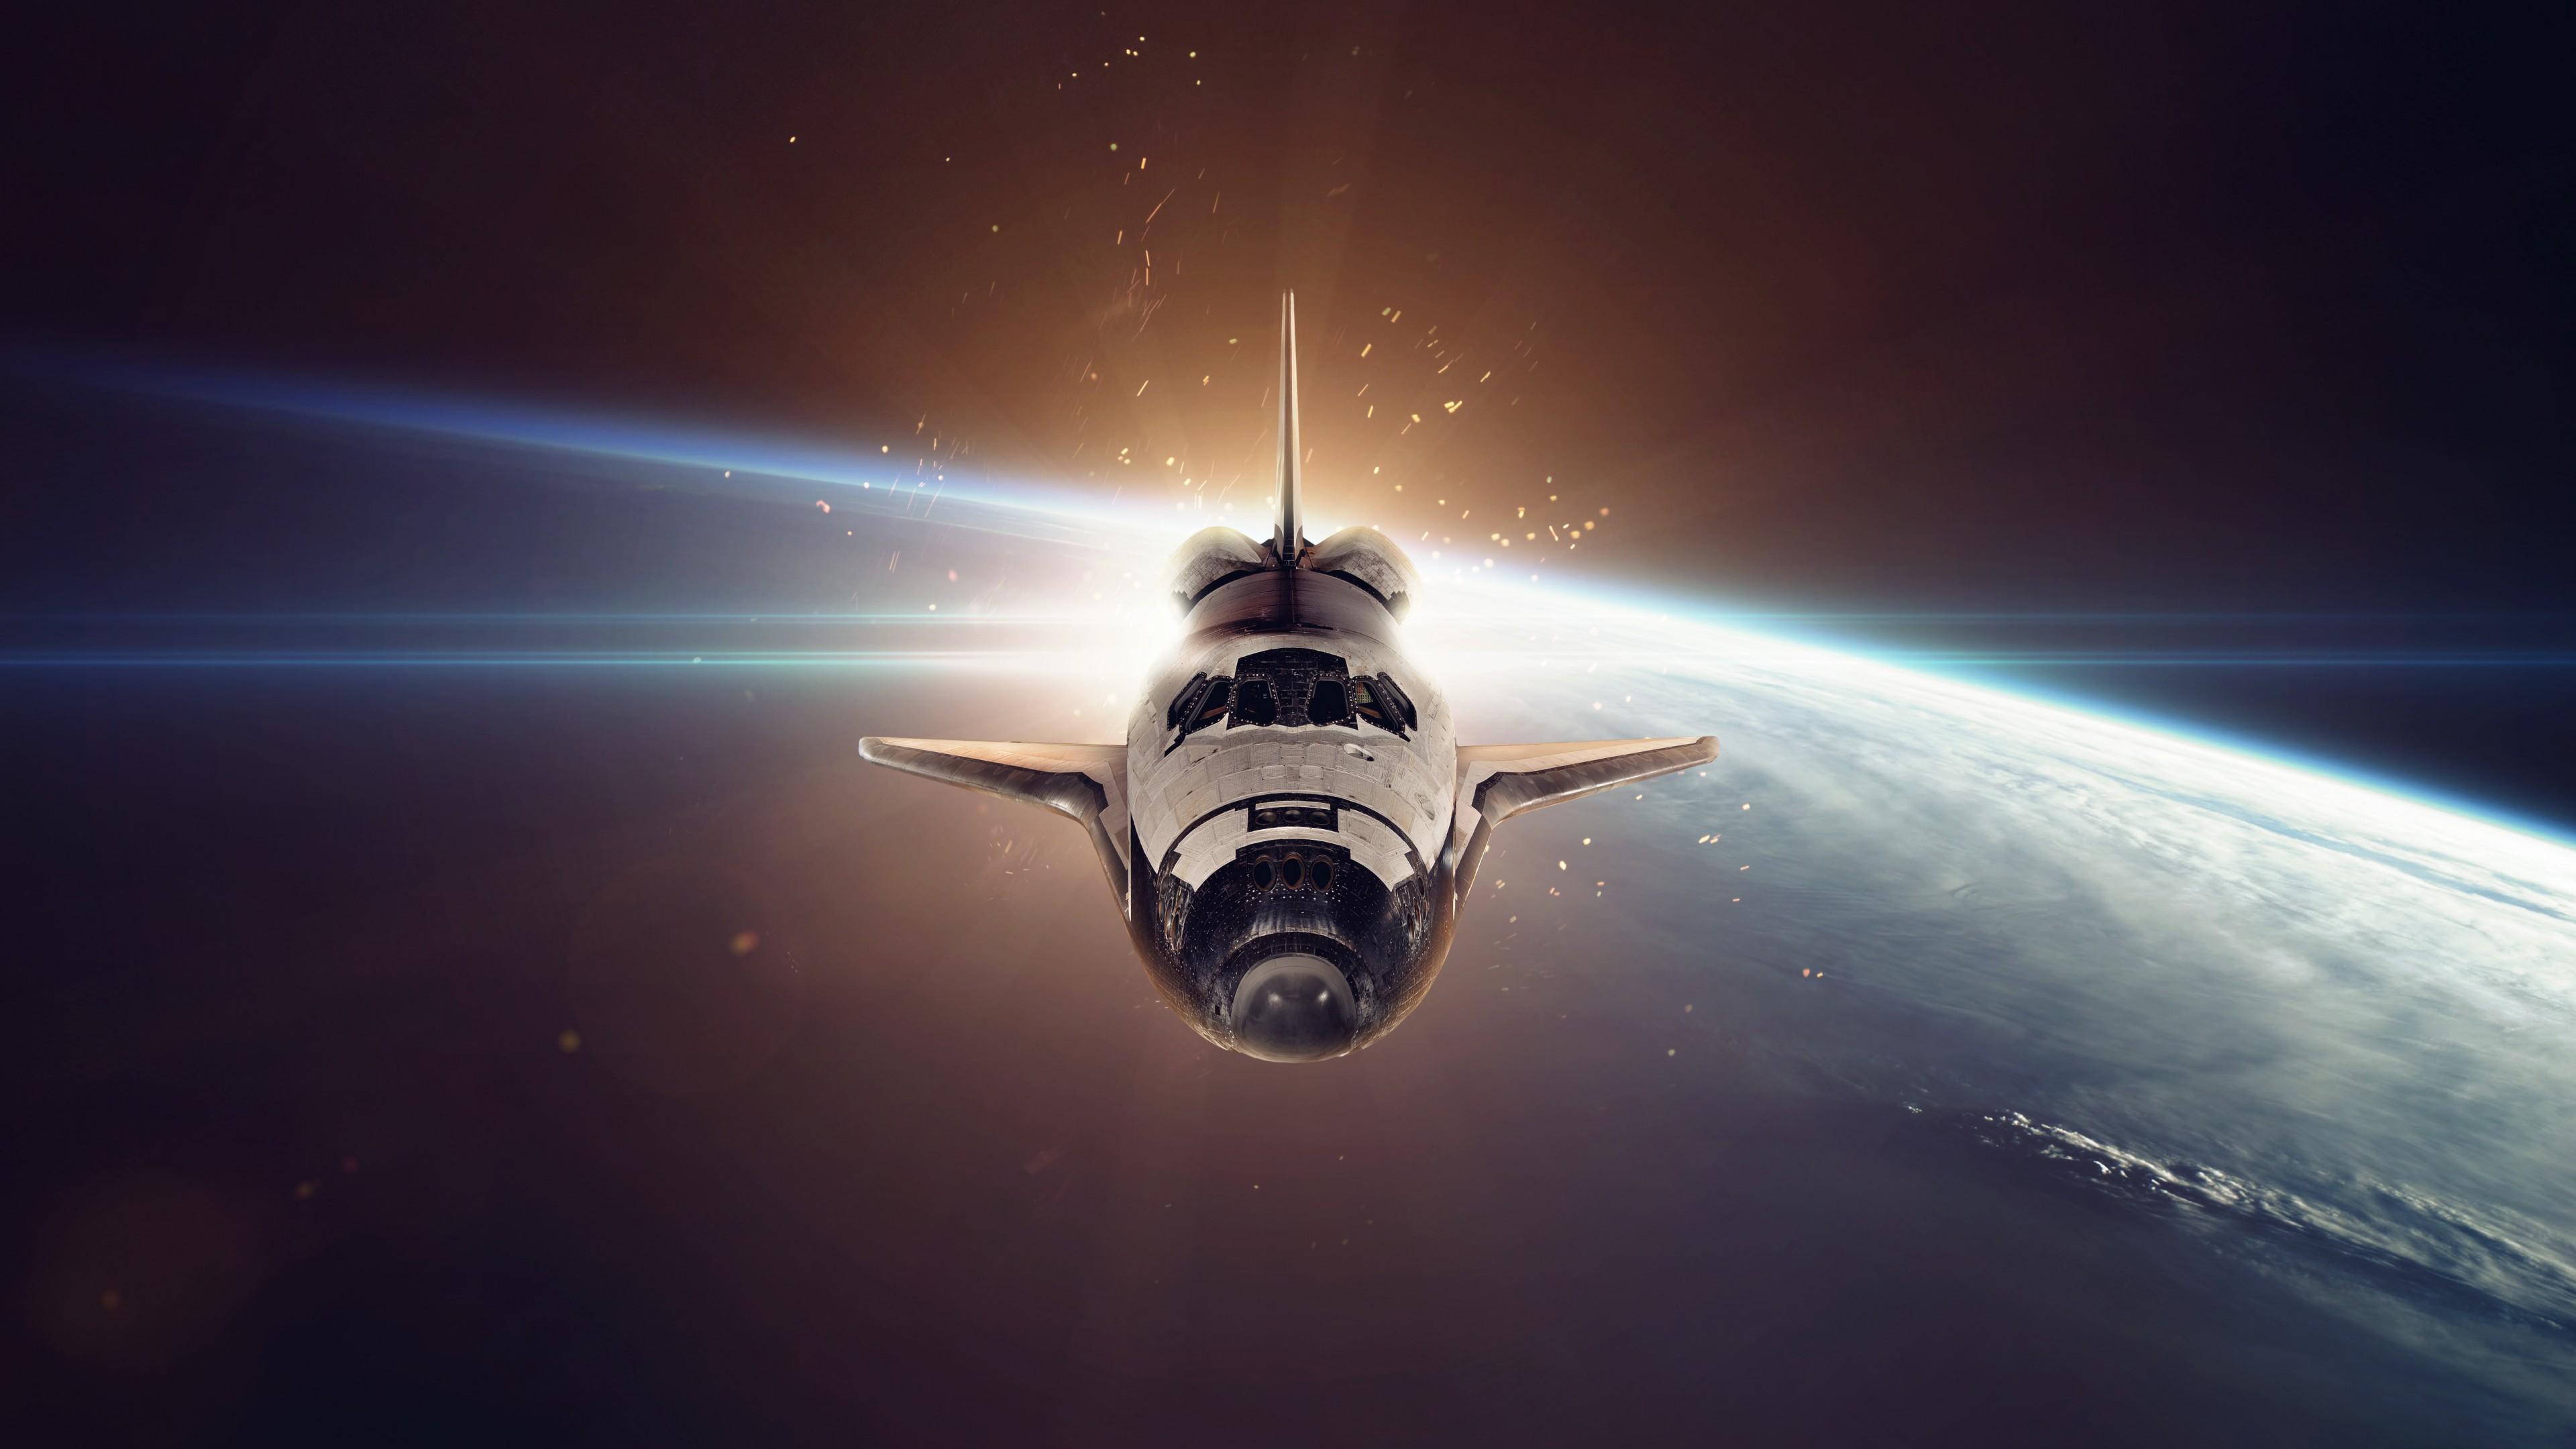 Wallpaper spaceship space galaxy 5k space 17526 - Spaceship wallpaper 4k ...